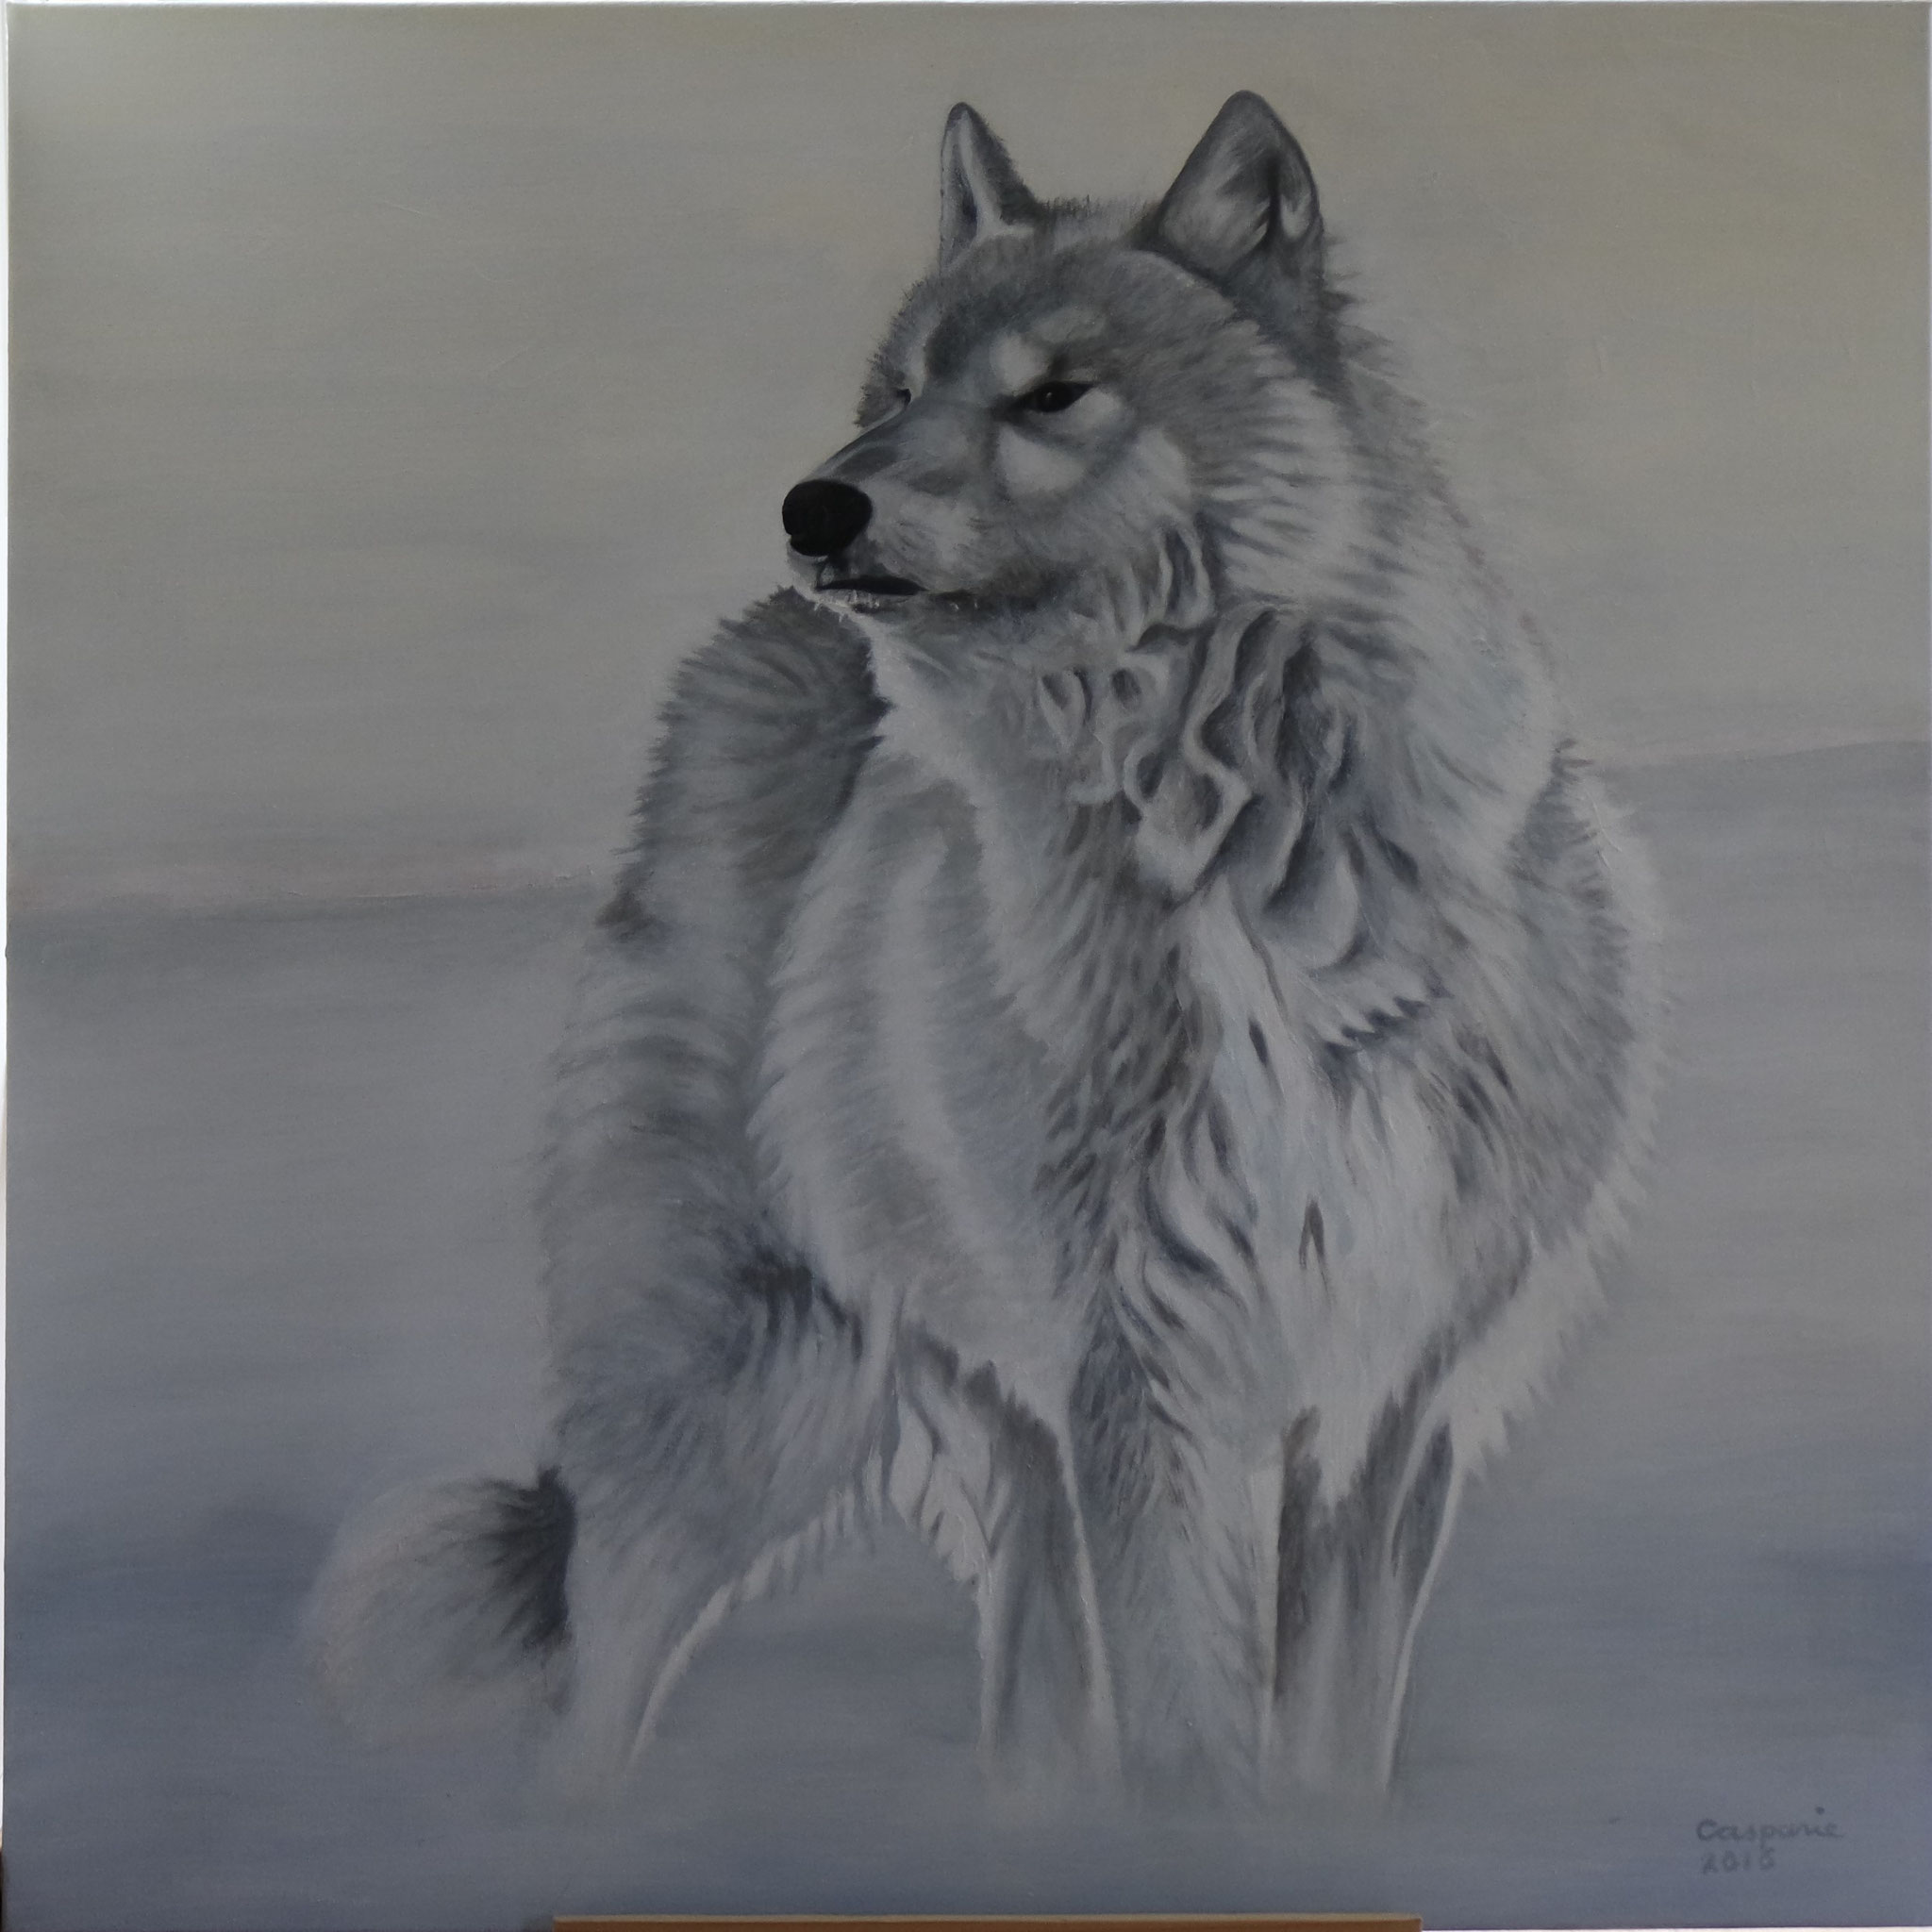 Poolwolf, Acryll op linnen, 90 x 90 cm.